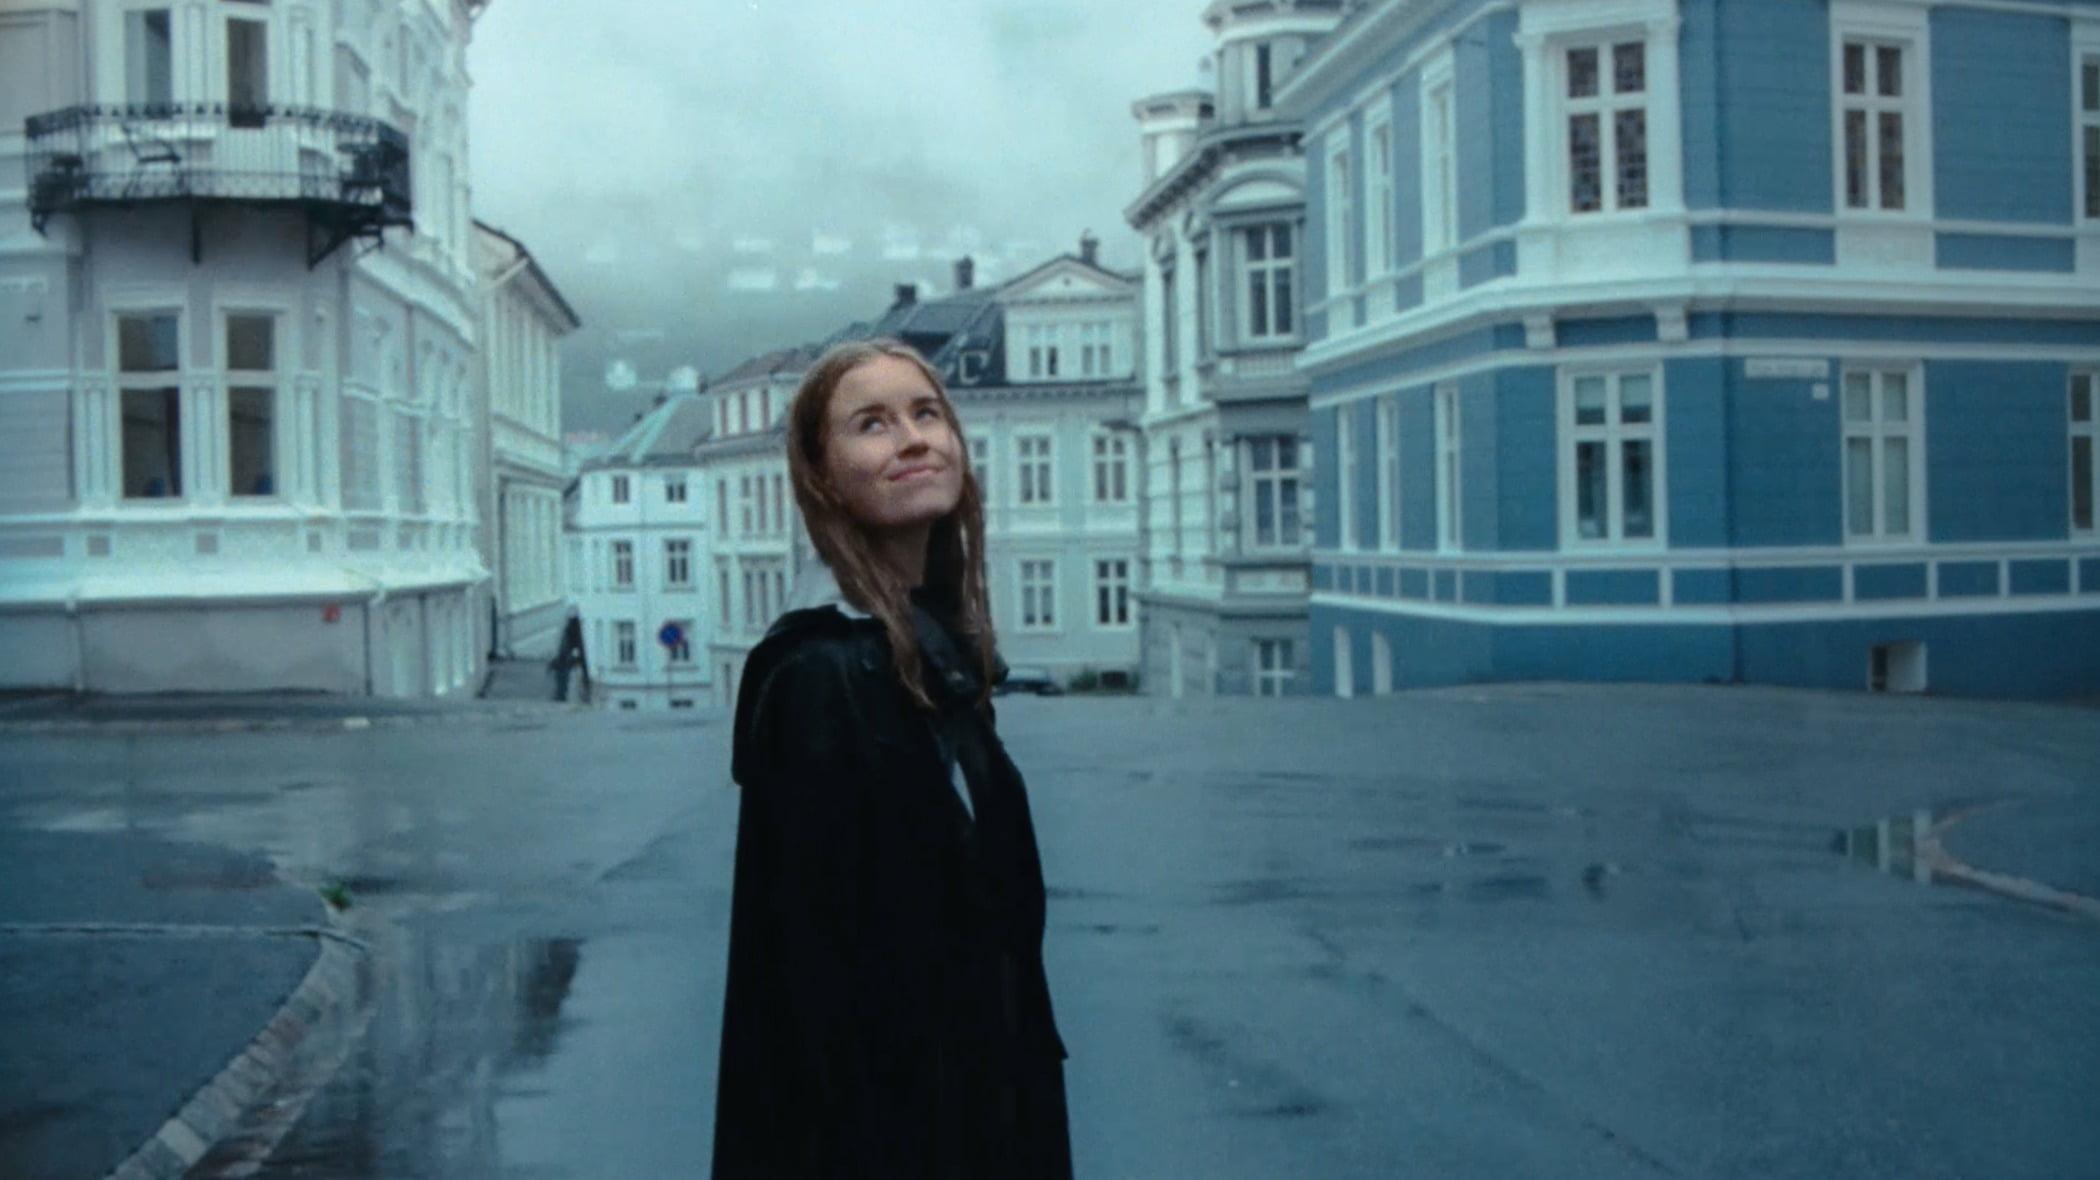 Flash photography, Street fashion, Daytime, Window, Building, Human, Sky, Grey